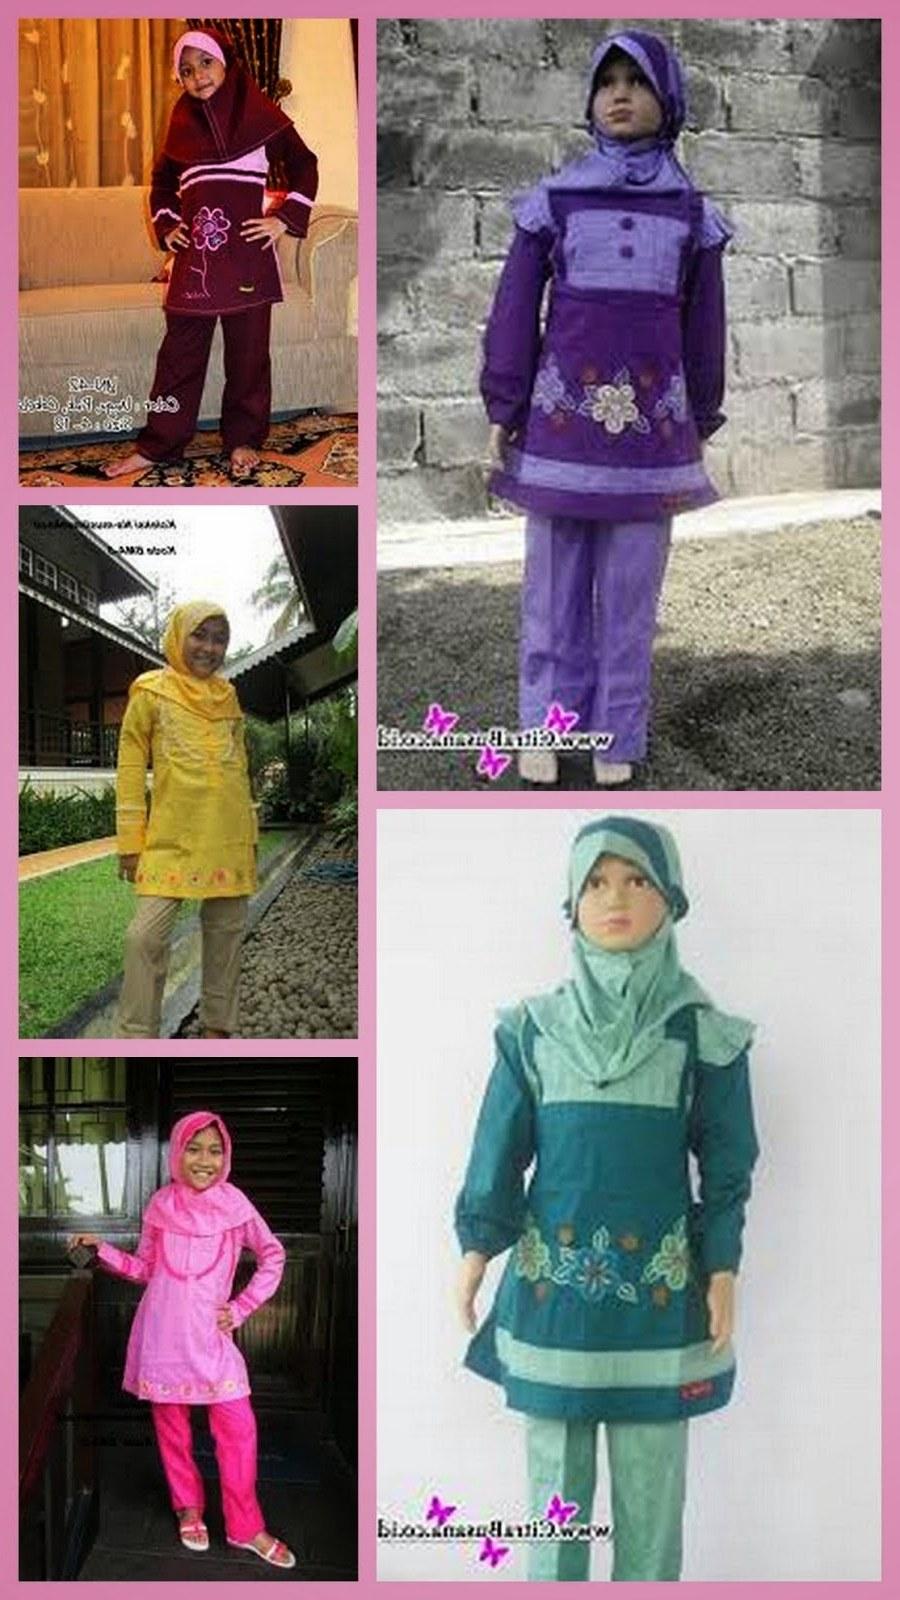 Ide Baju Lebaran Anak Muslim Irdz Baju Muslim Anak Wanita Usia 13 Tahun Untuk Lebaran